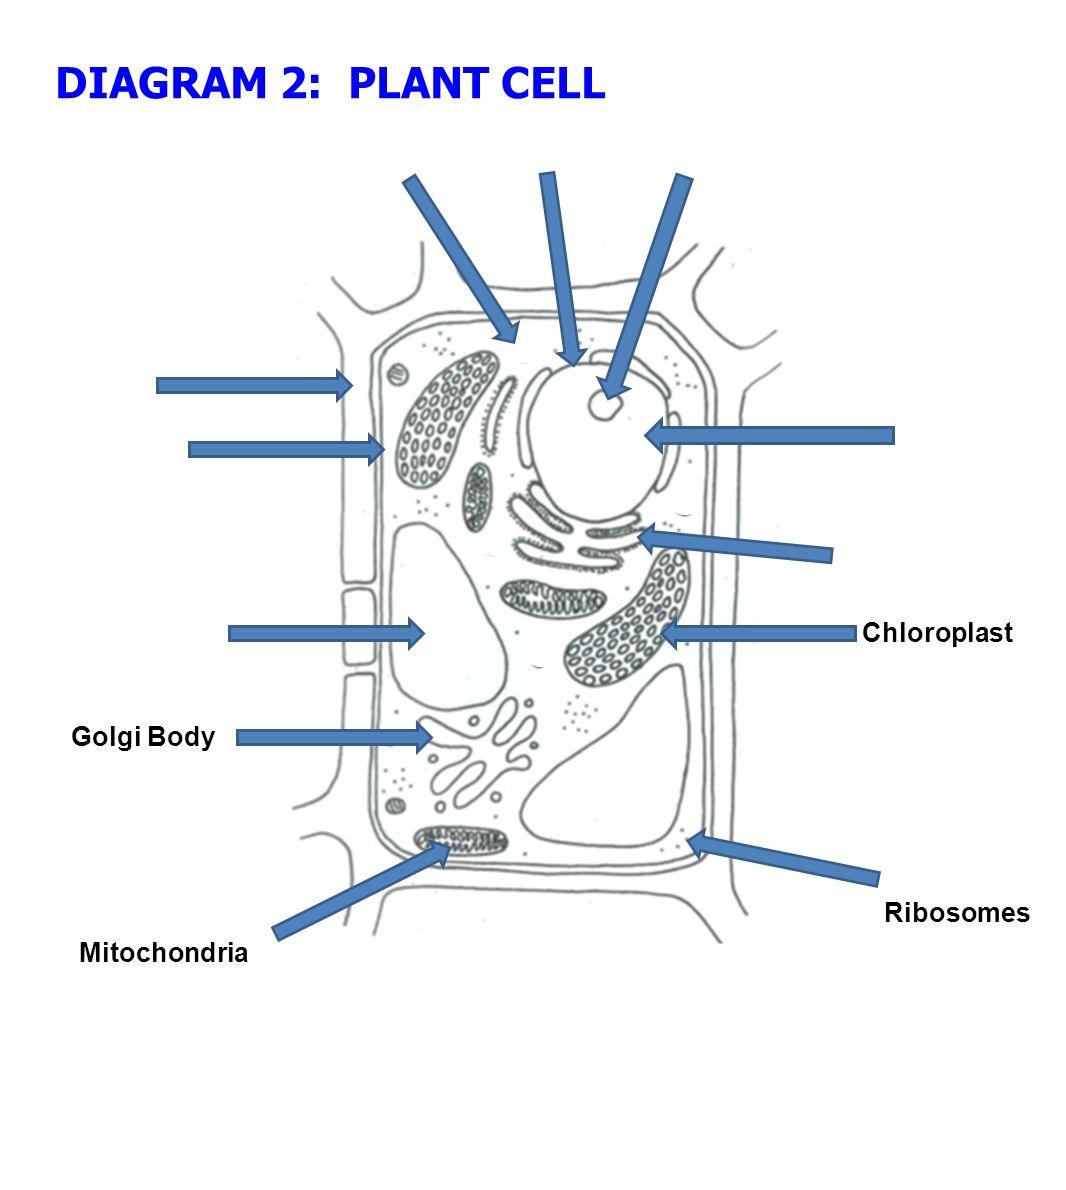 hight resolution of 23 diagram 2 plant cell chloroplast golgi body ribosomes mitochondria